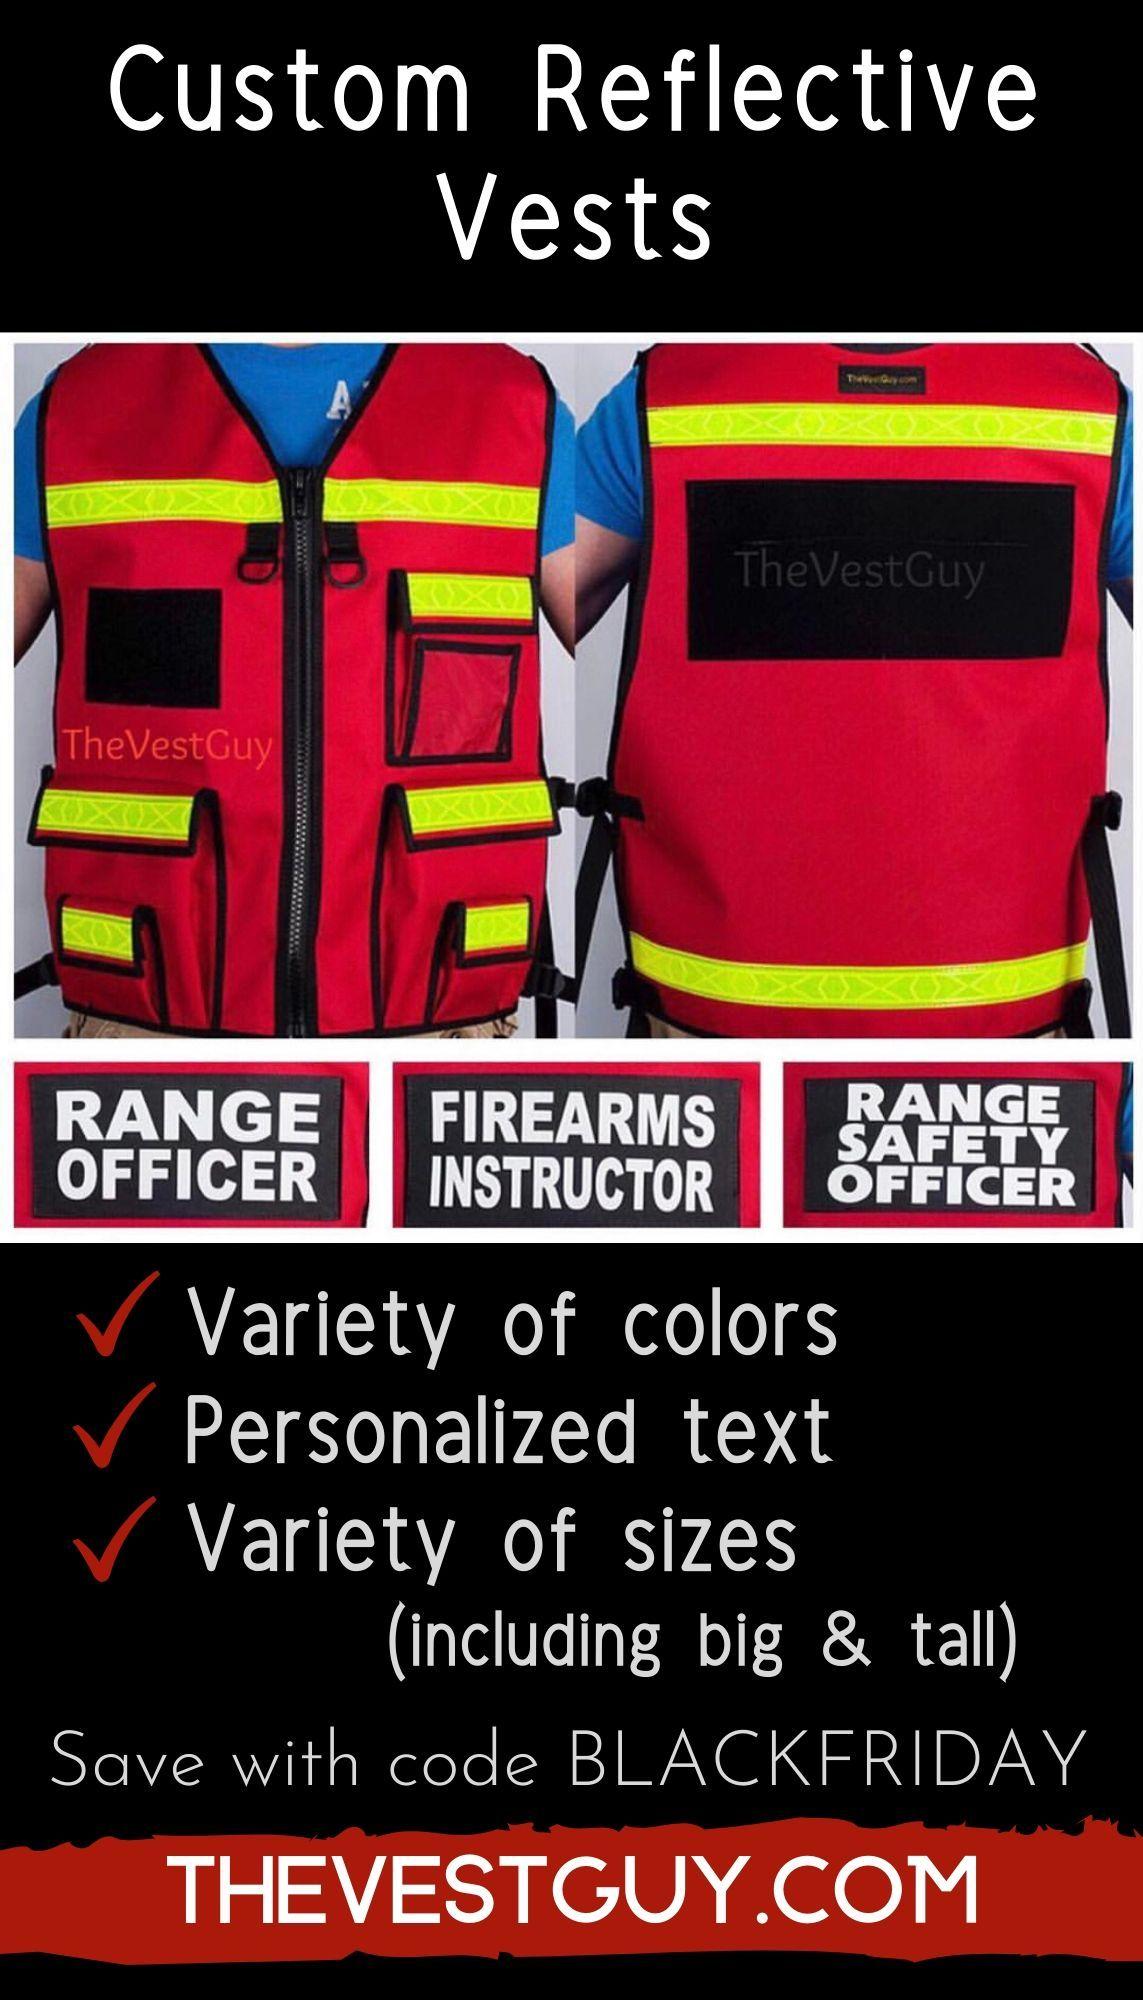 Custom reflective vests for Range Officer, Firearms